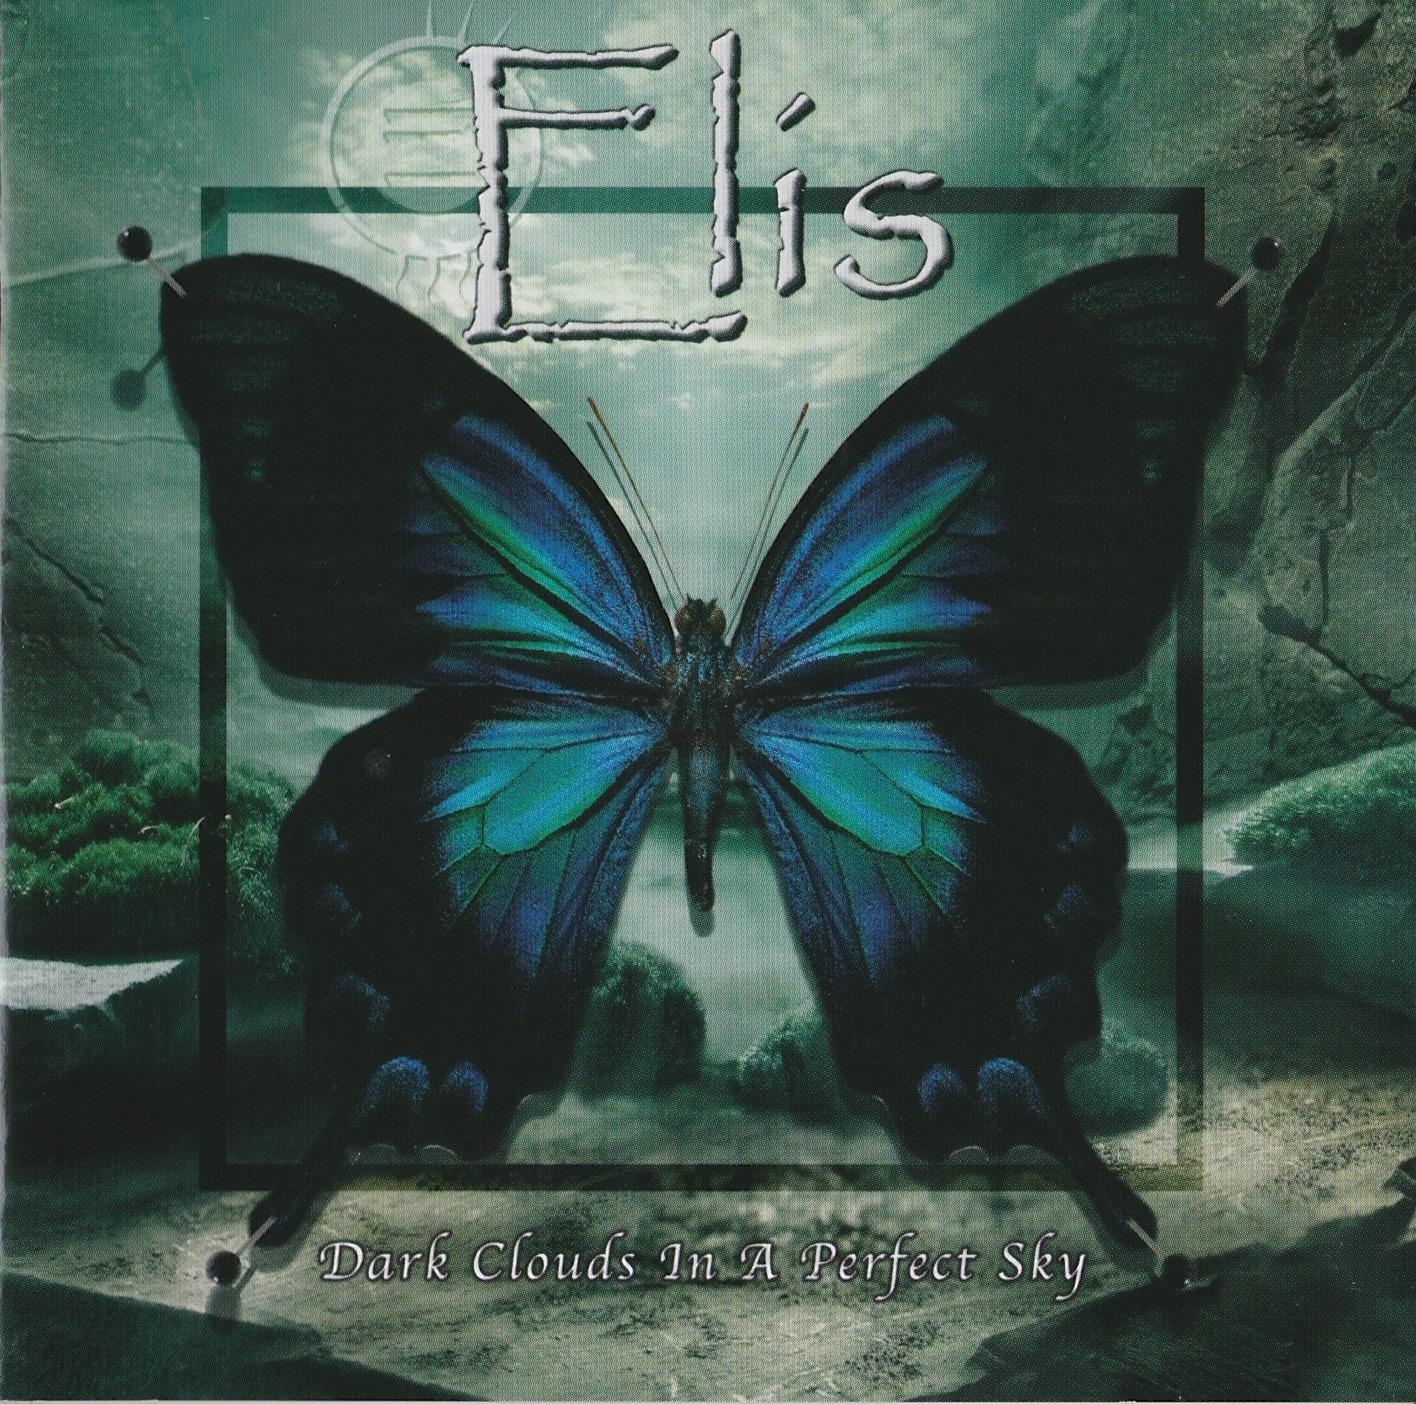 Elis — Dark Clouds In A Perfect Sky (2004)